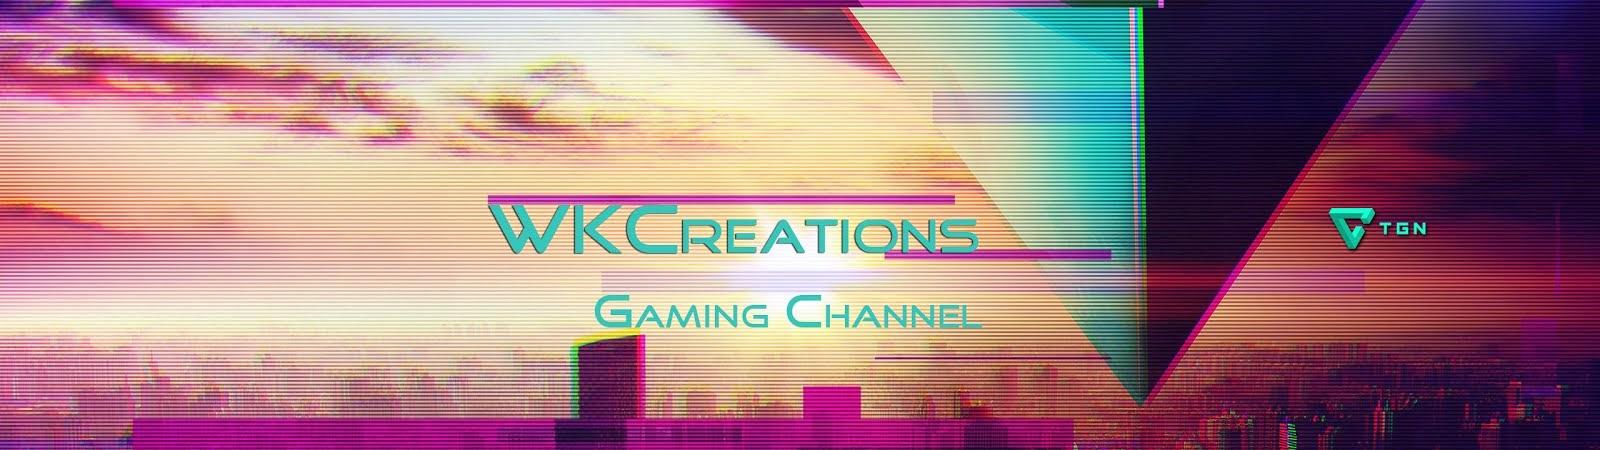 WKCreations